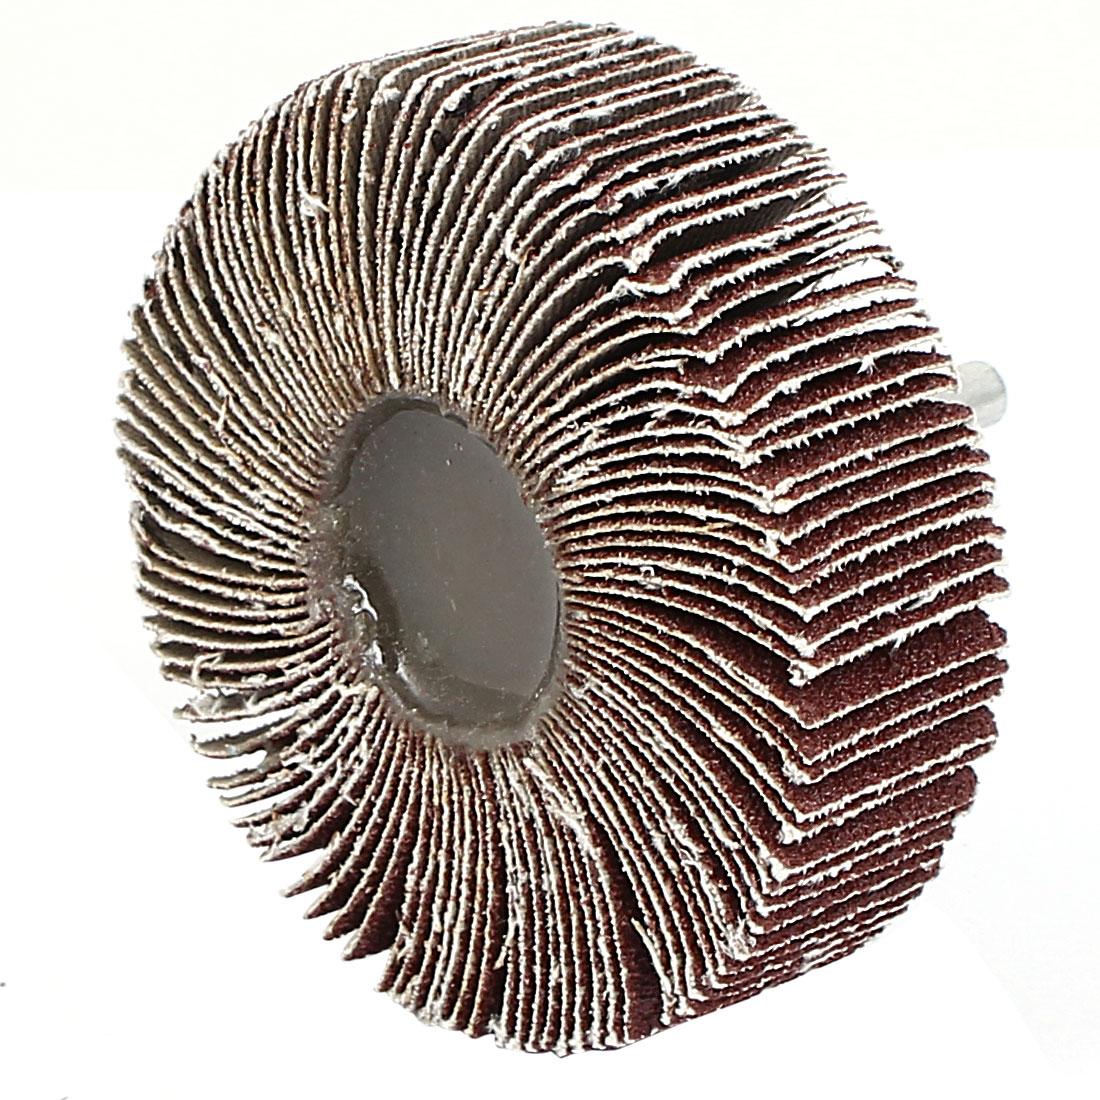 80mm Dia Grinding Sanding Sandpaper Buffing Flap Wheel Disc 80 Grit for Rotary